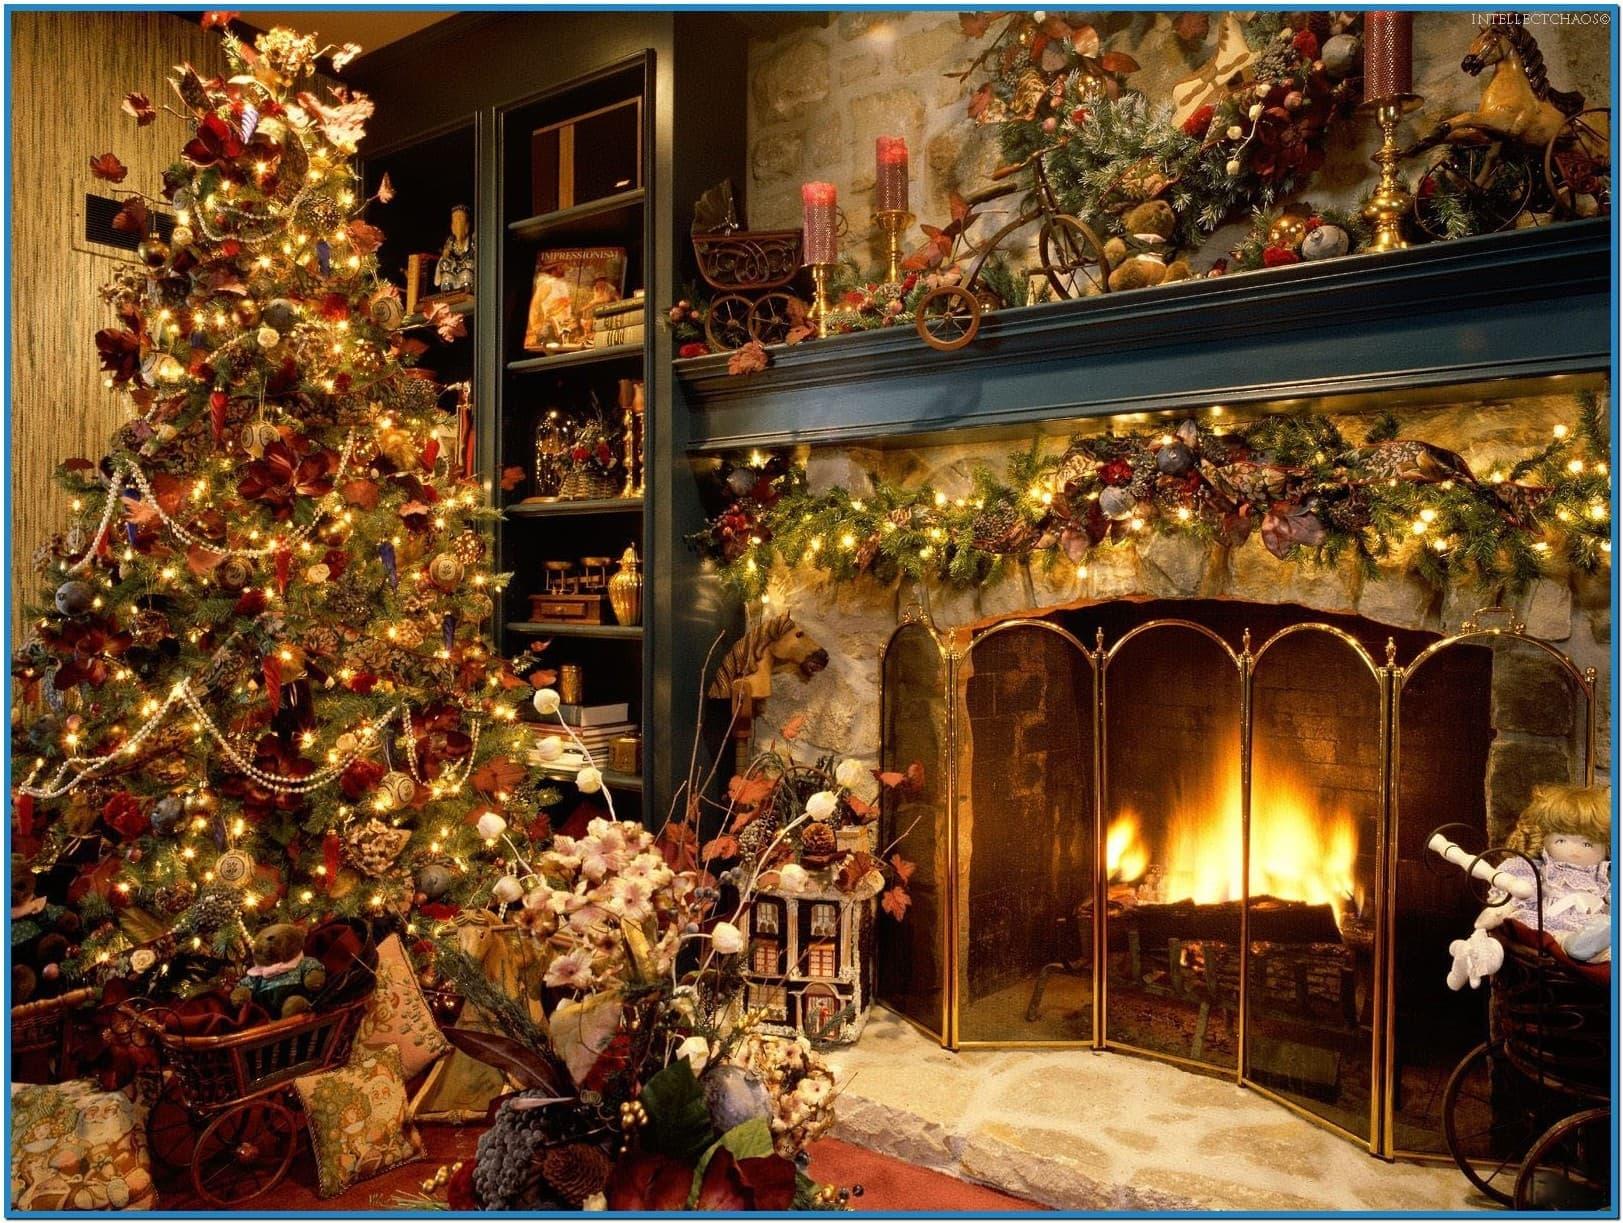 Holiday screensavers and wallpaper - Download free